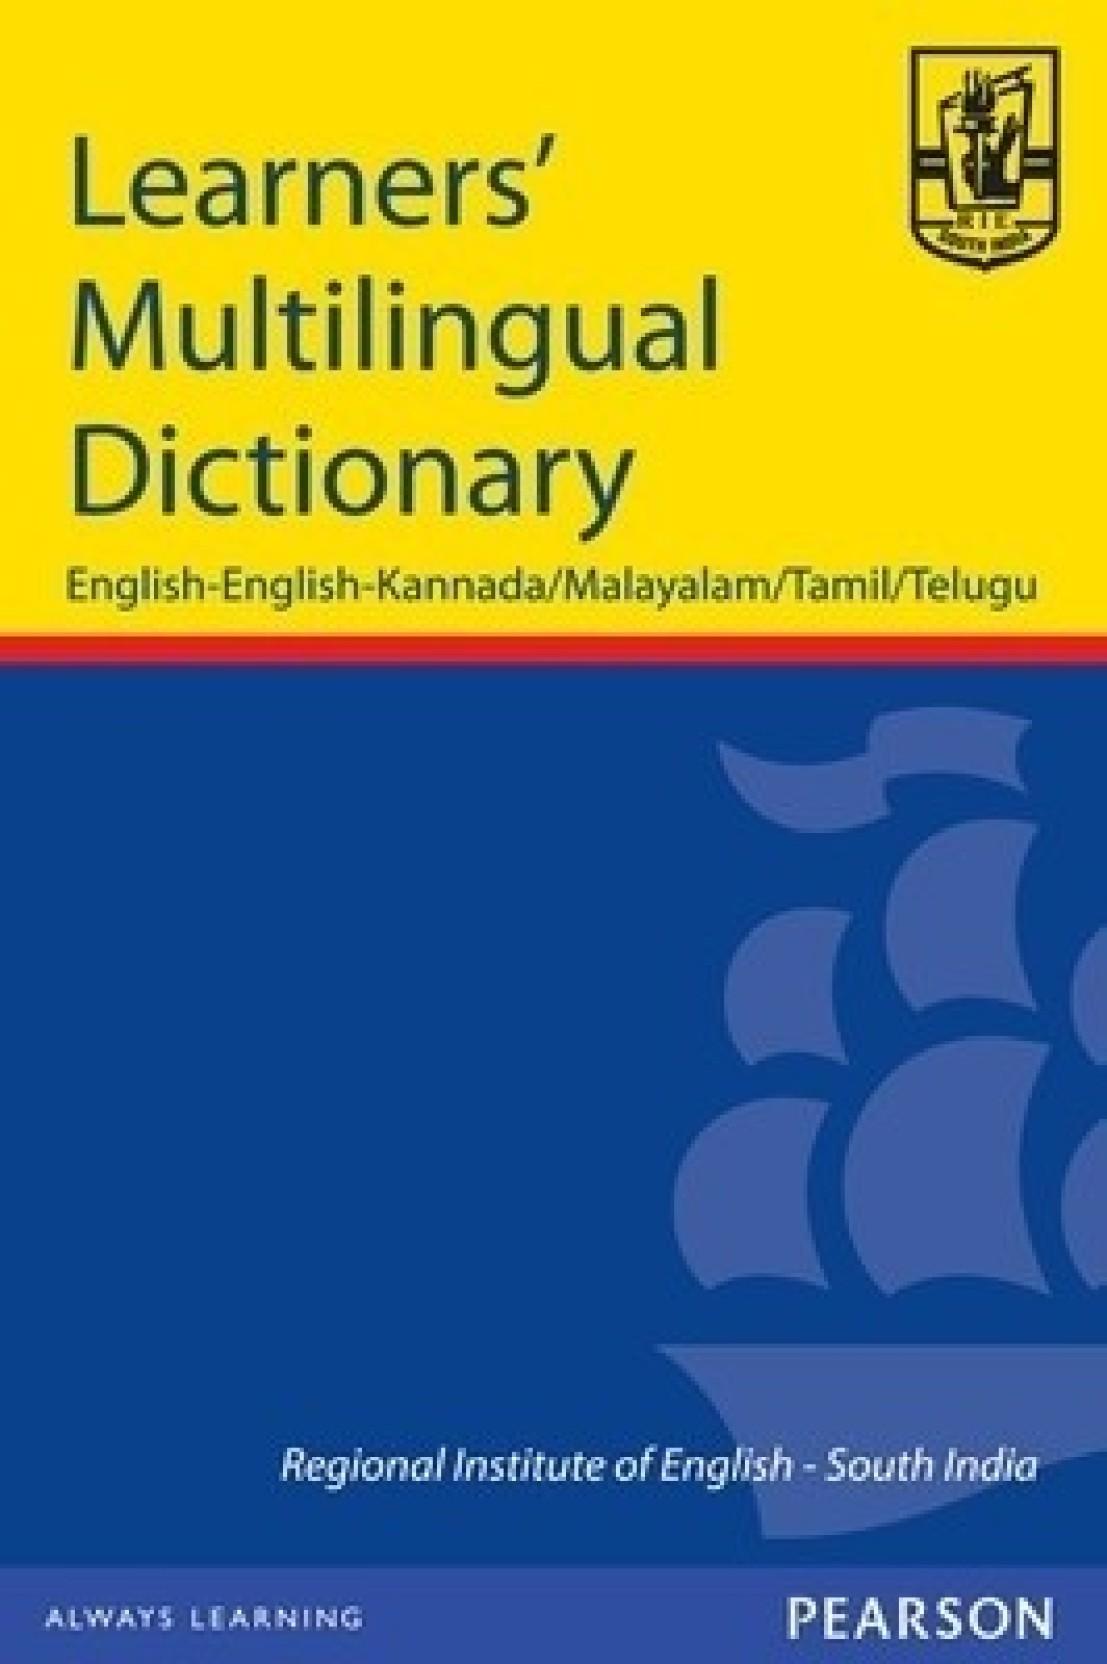 Learners Multilingual Dictionary : English-English-Kannada